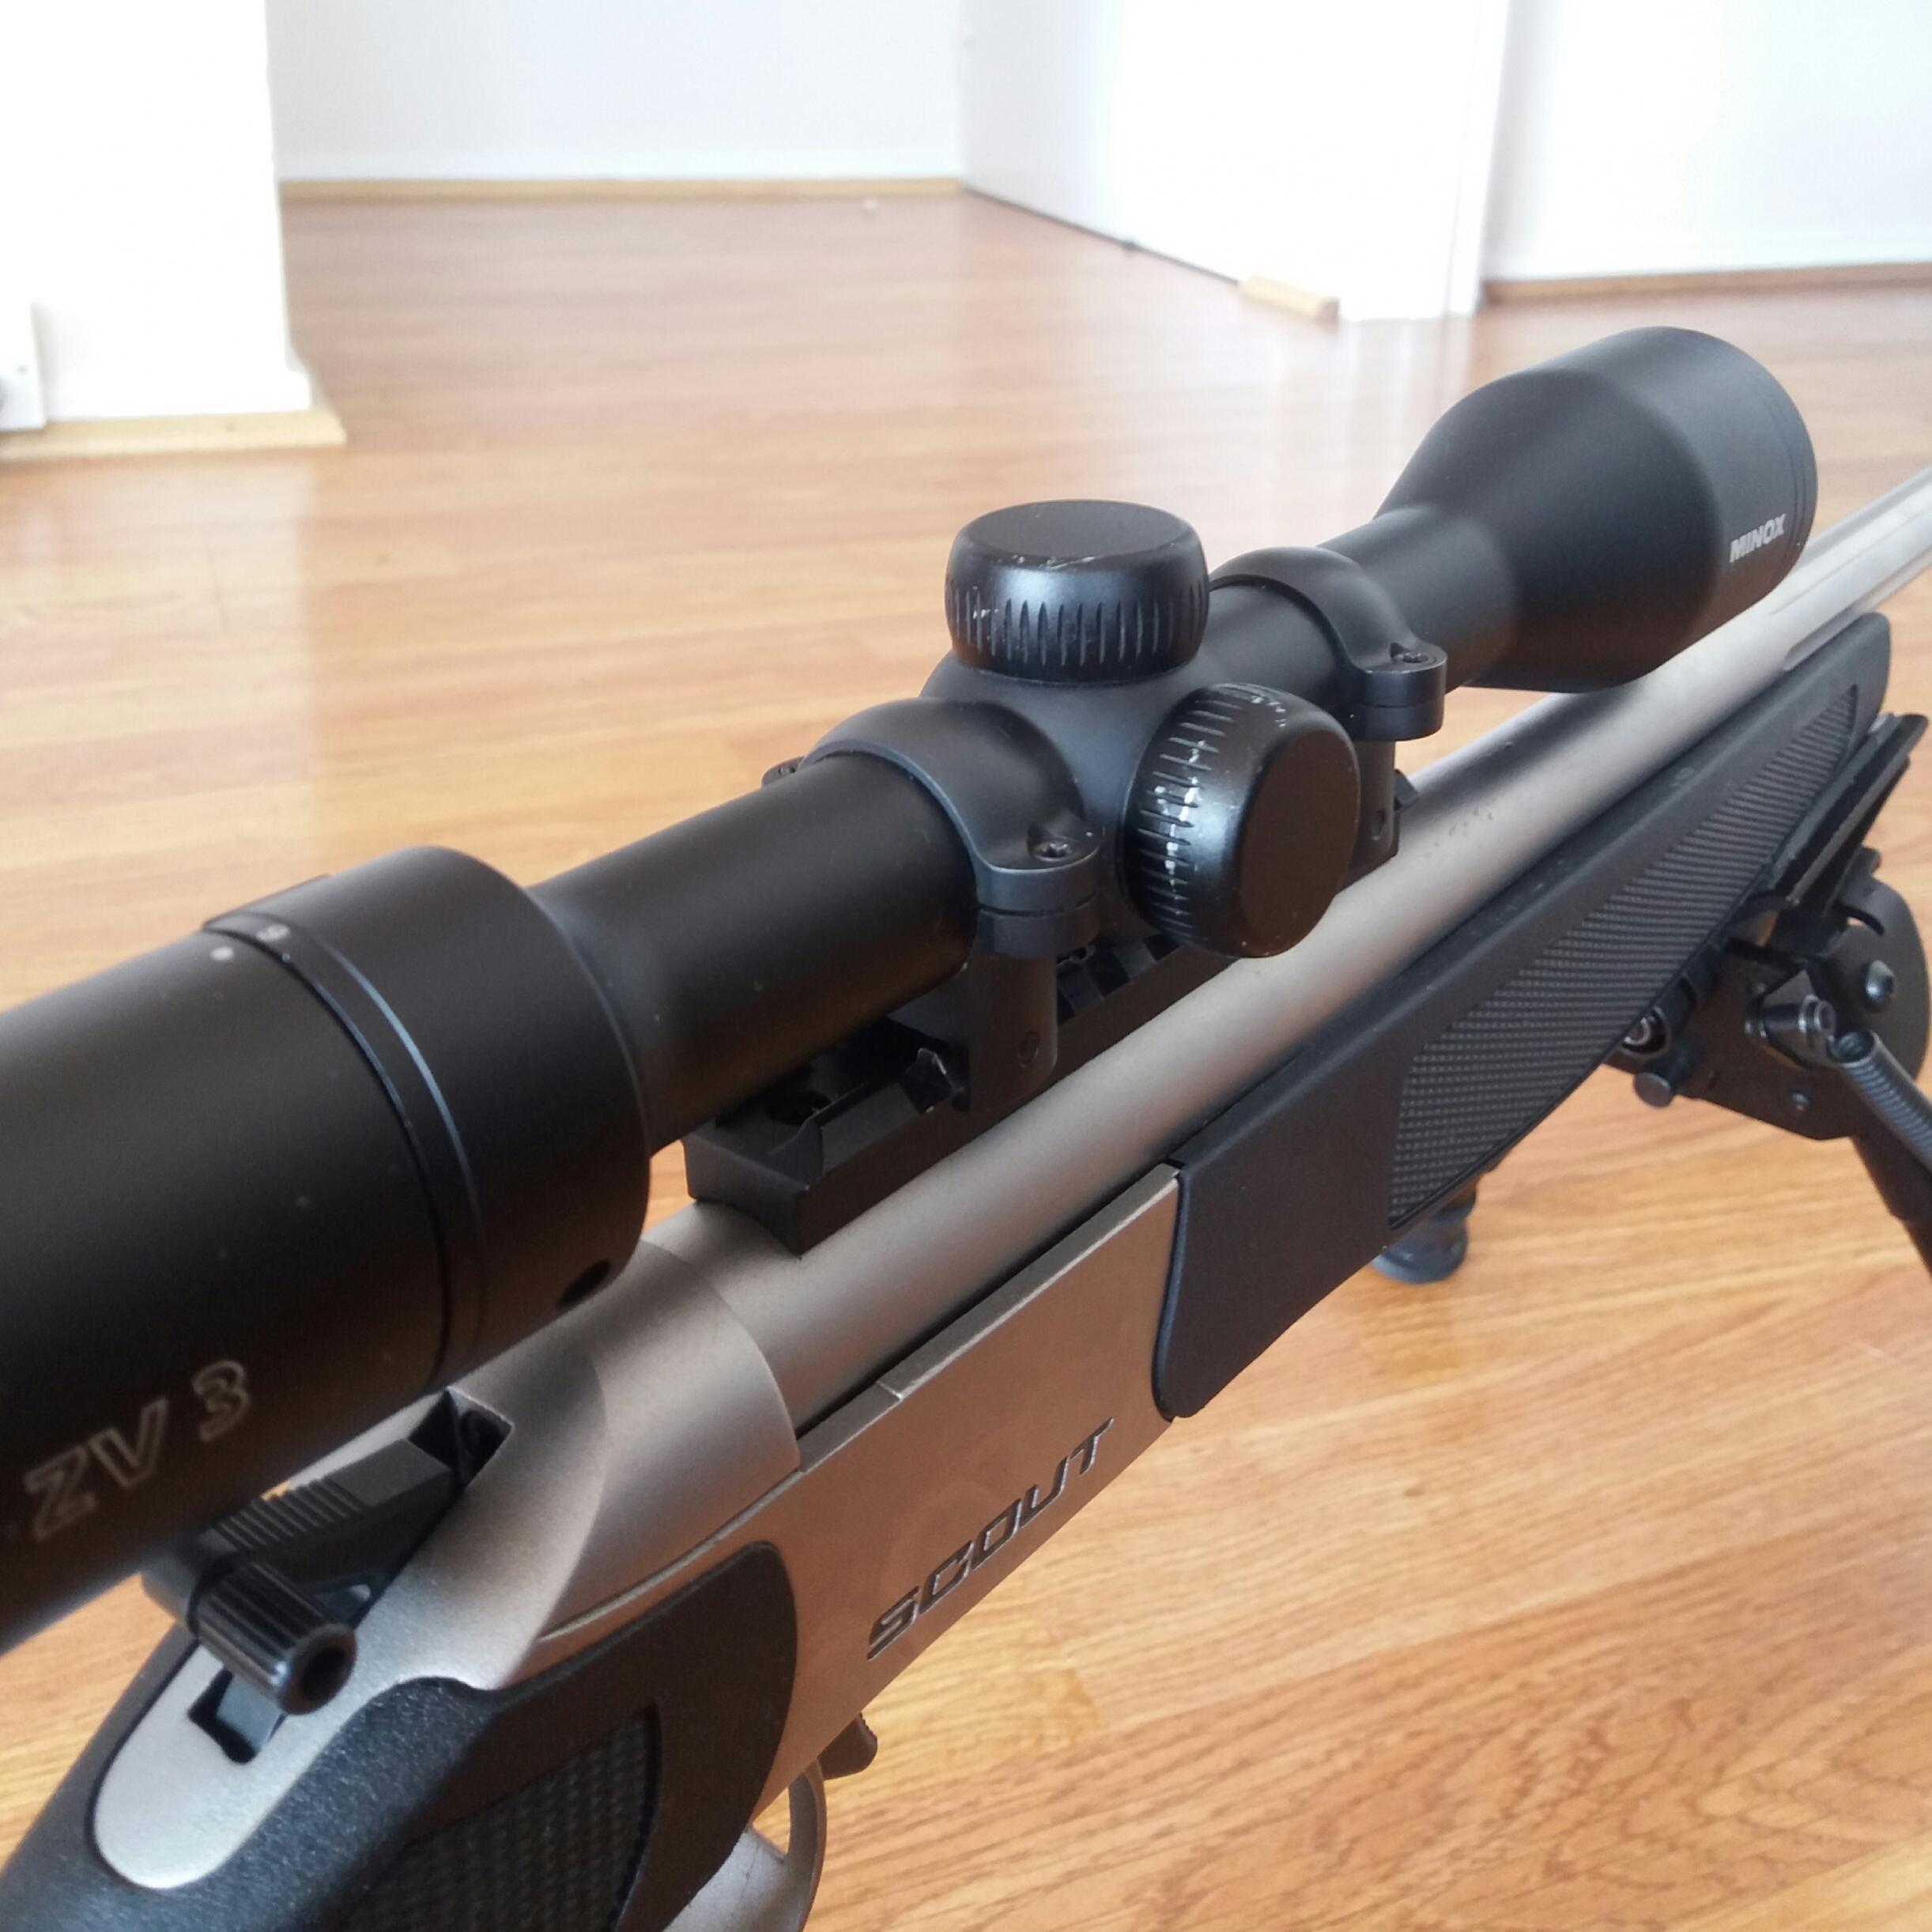 Scope mounts for Bergara Scout - Optics-trade